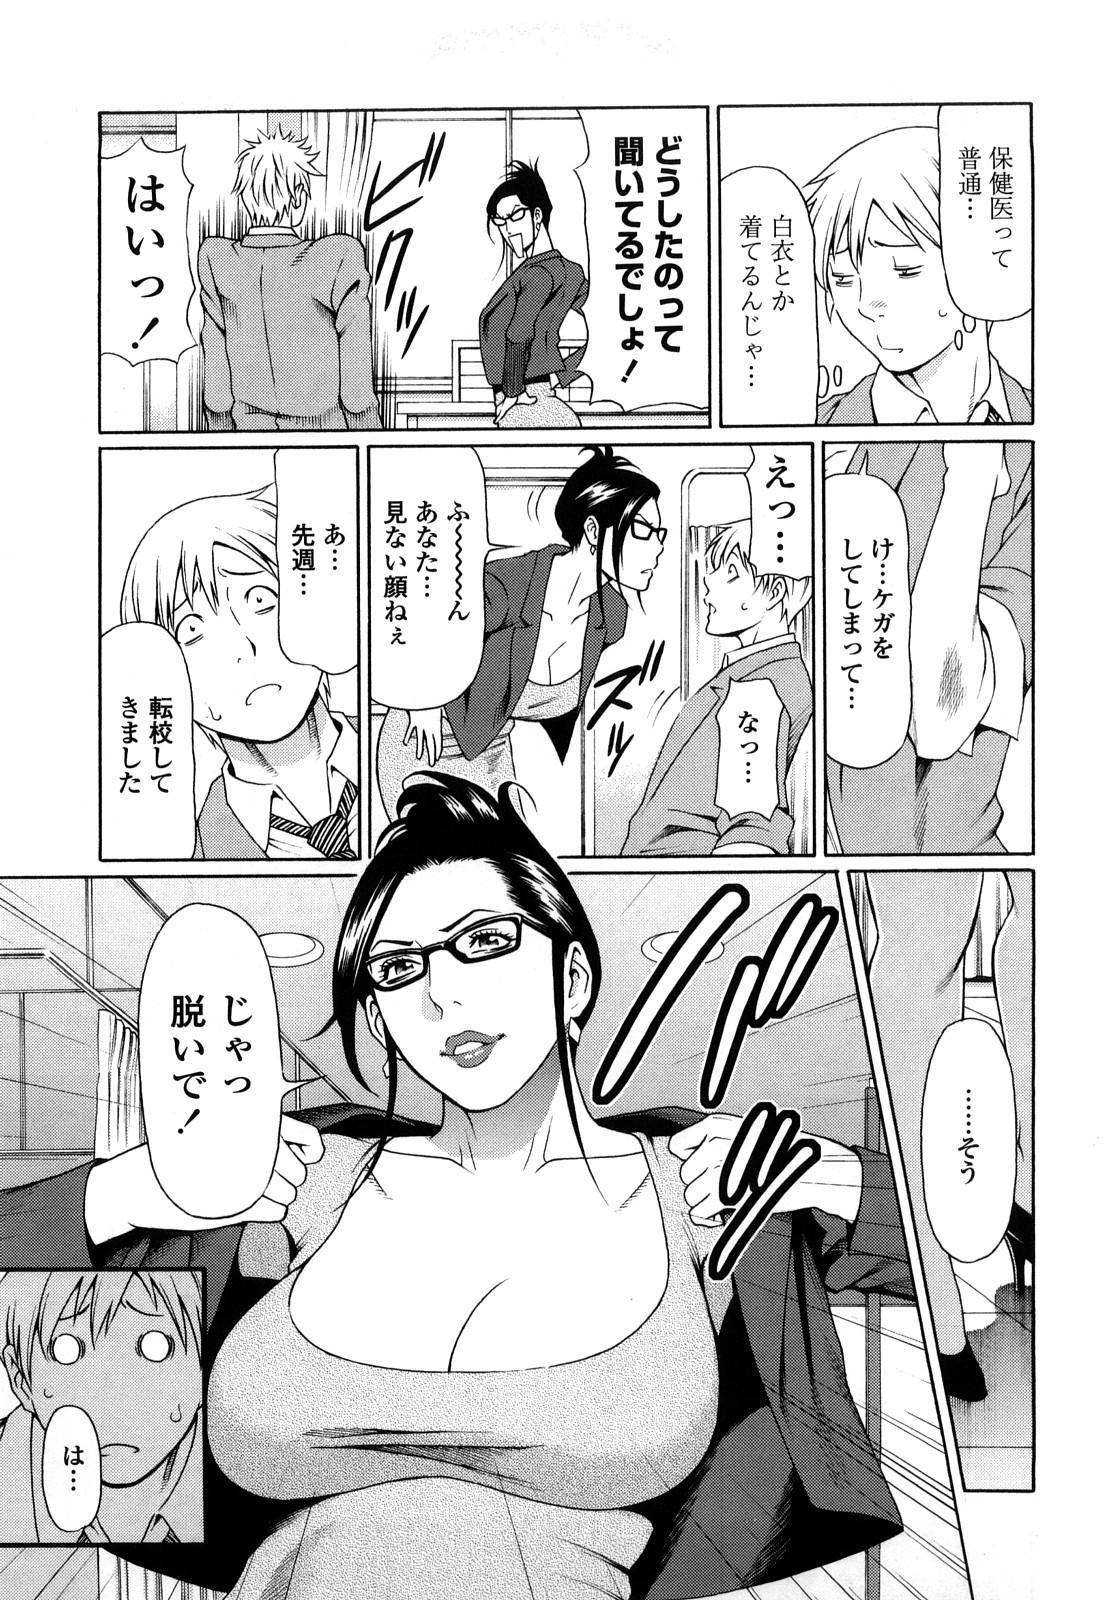 [Takasugi Kou] Kindan no Haha-Ana - Immorality Love-Hole [Decensored] 158